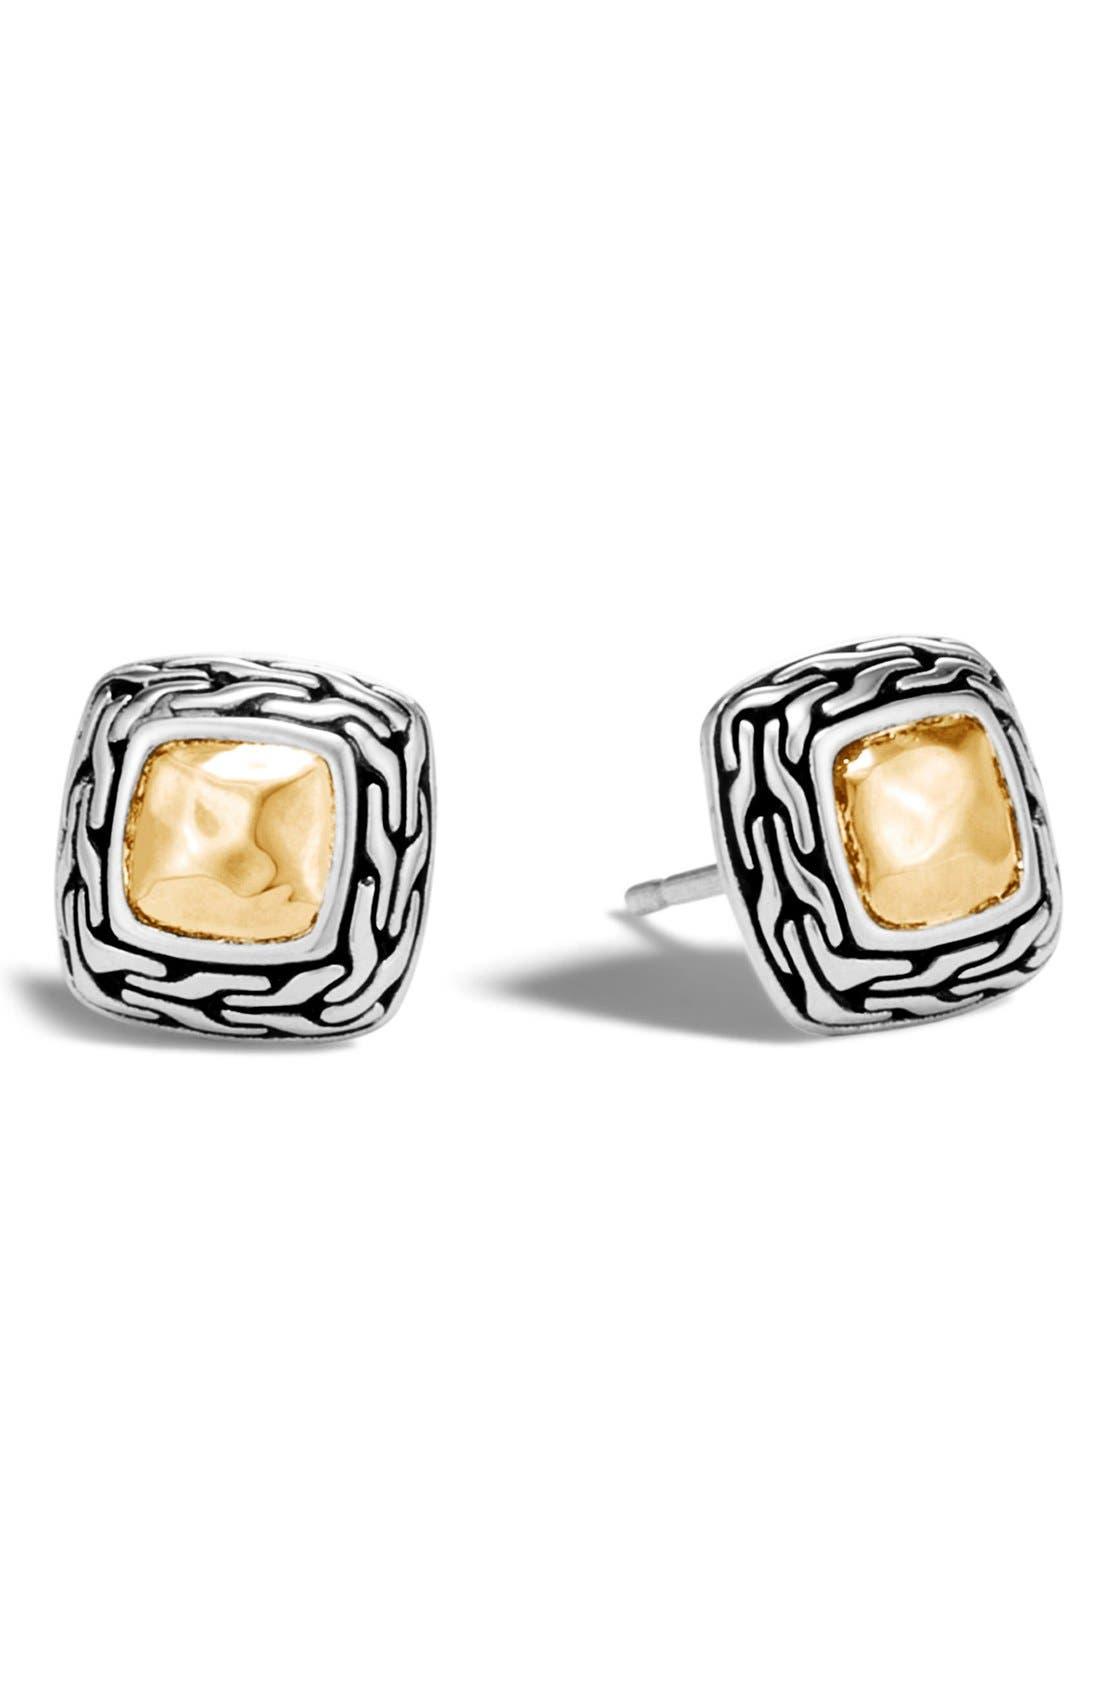 JOHN HARDY, Heritage Stud Earrings, Main thumbnail 1, color, SILVER/ GOLD